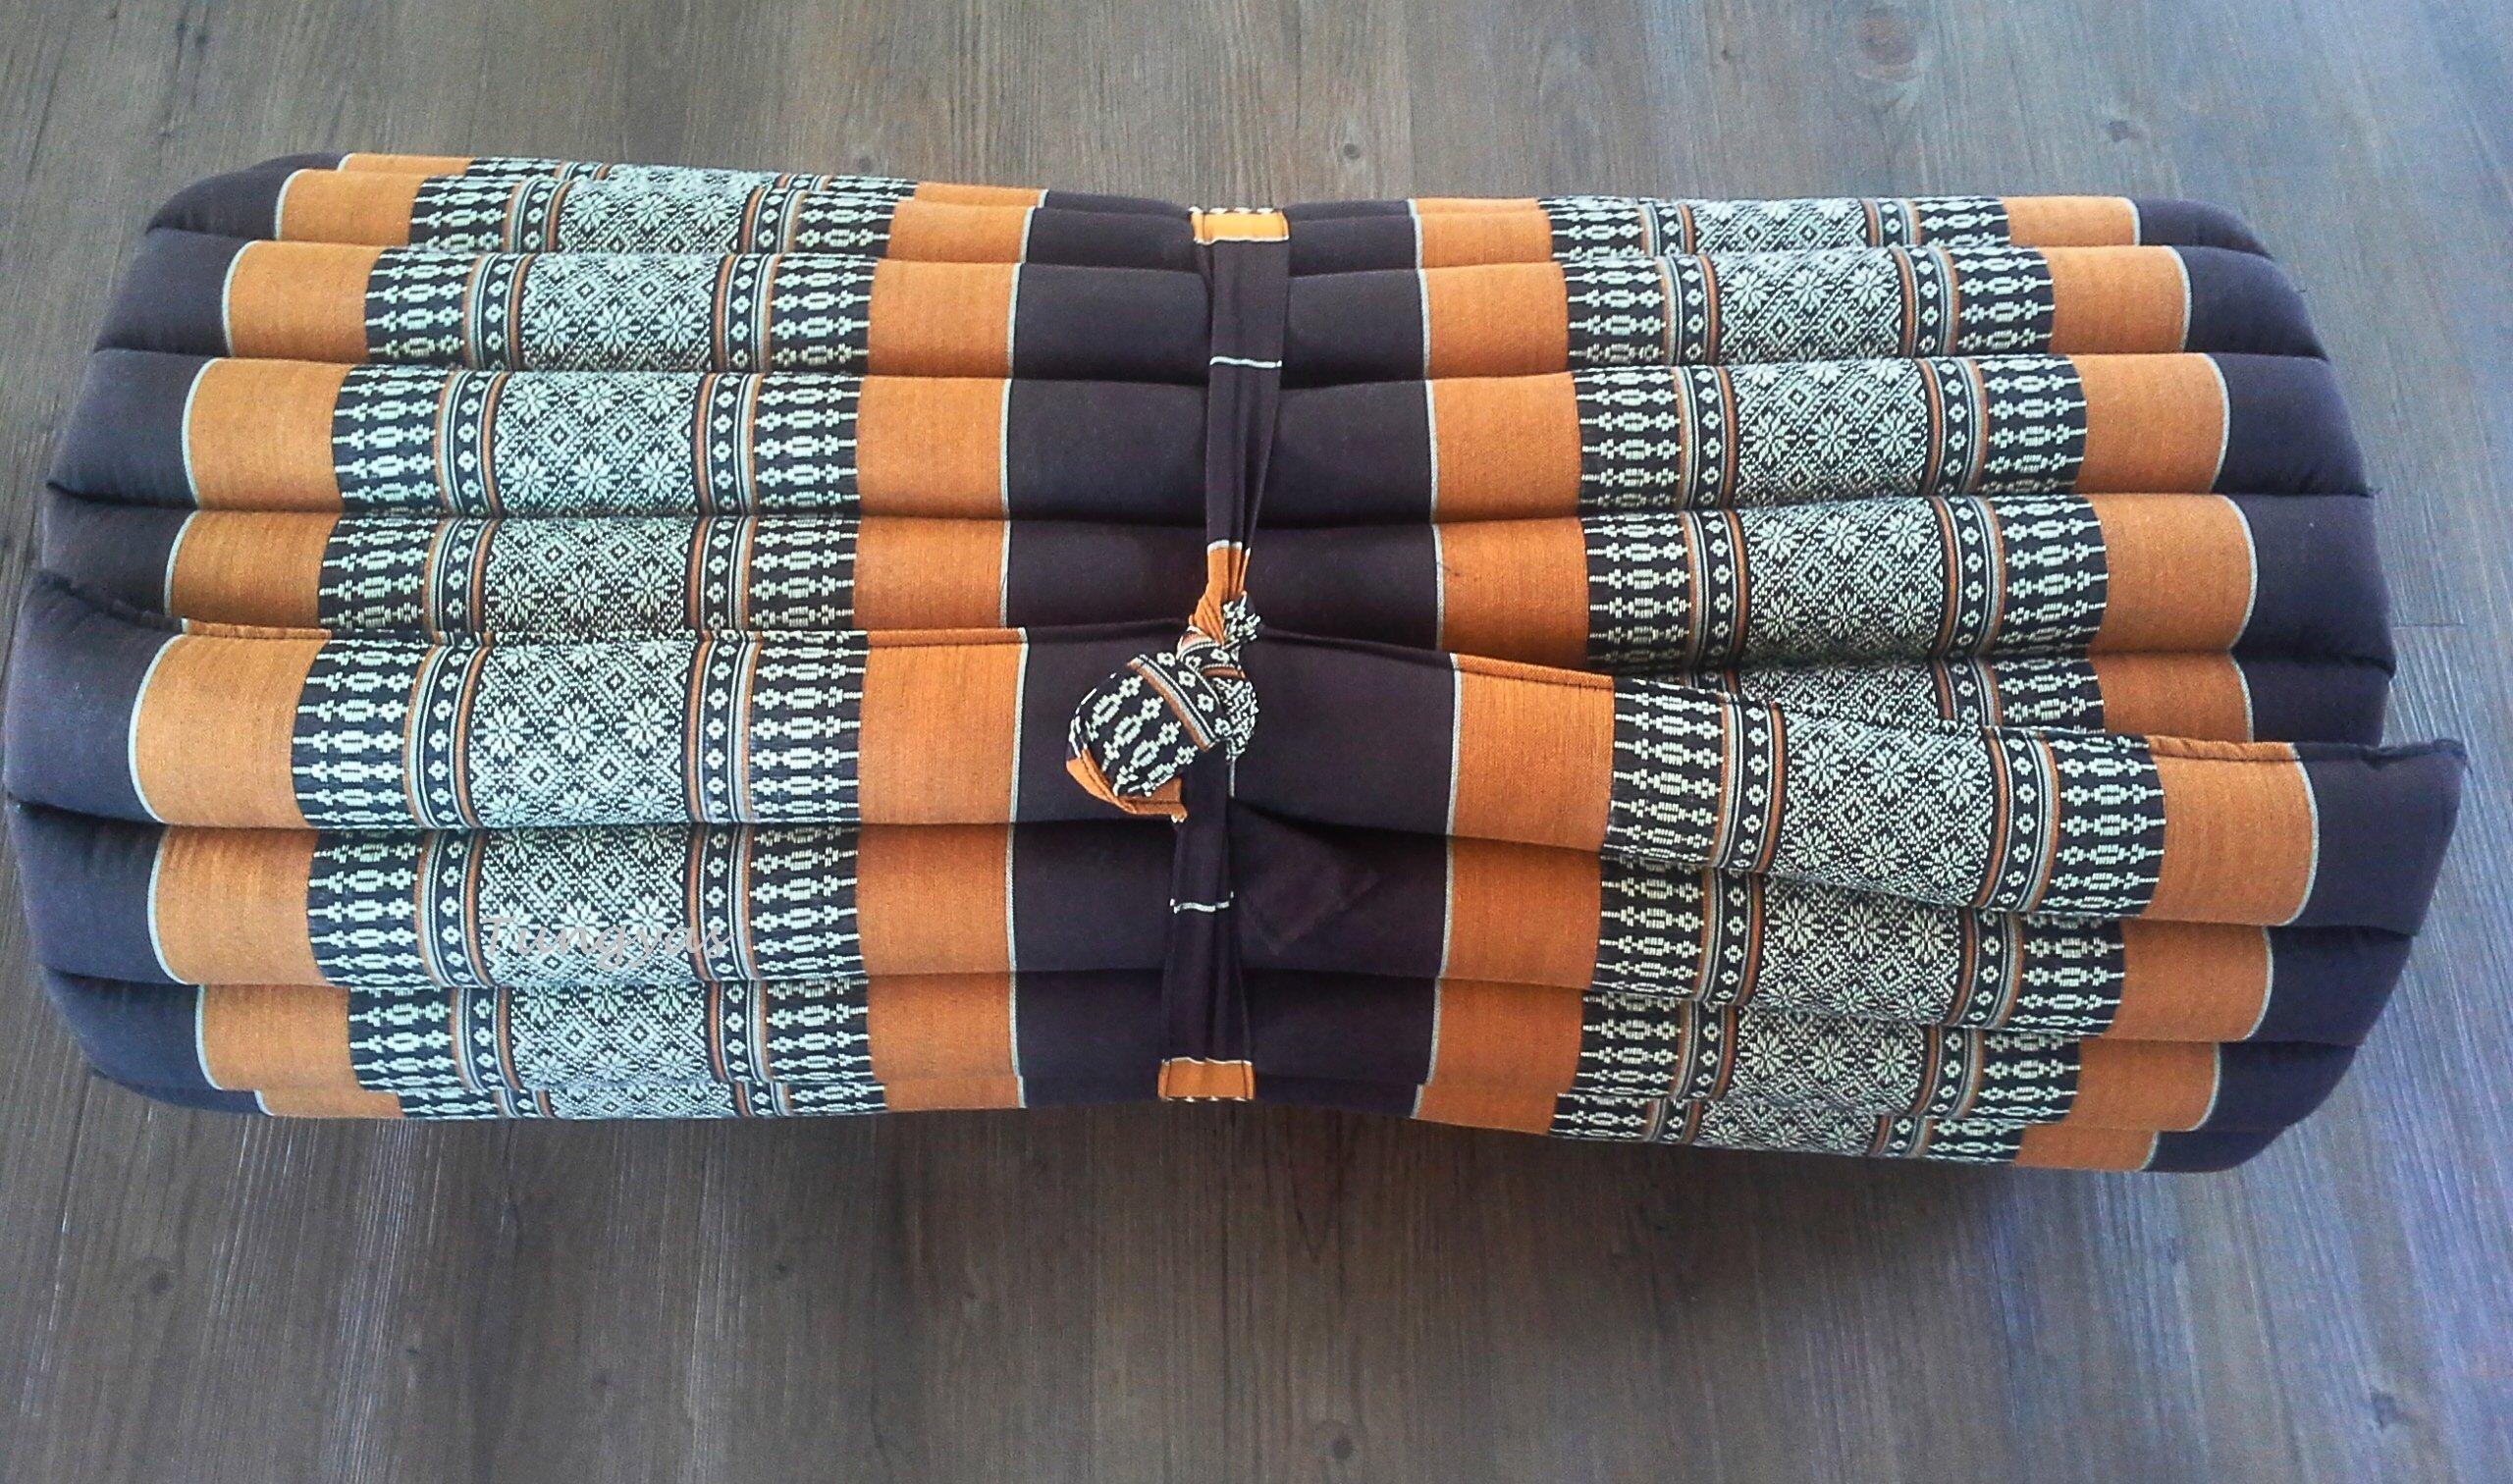 Roll up Thai Mat Fold Out Mattress Cushion Organic 100%Kapok (Gold Metallic)